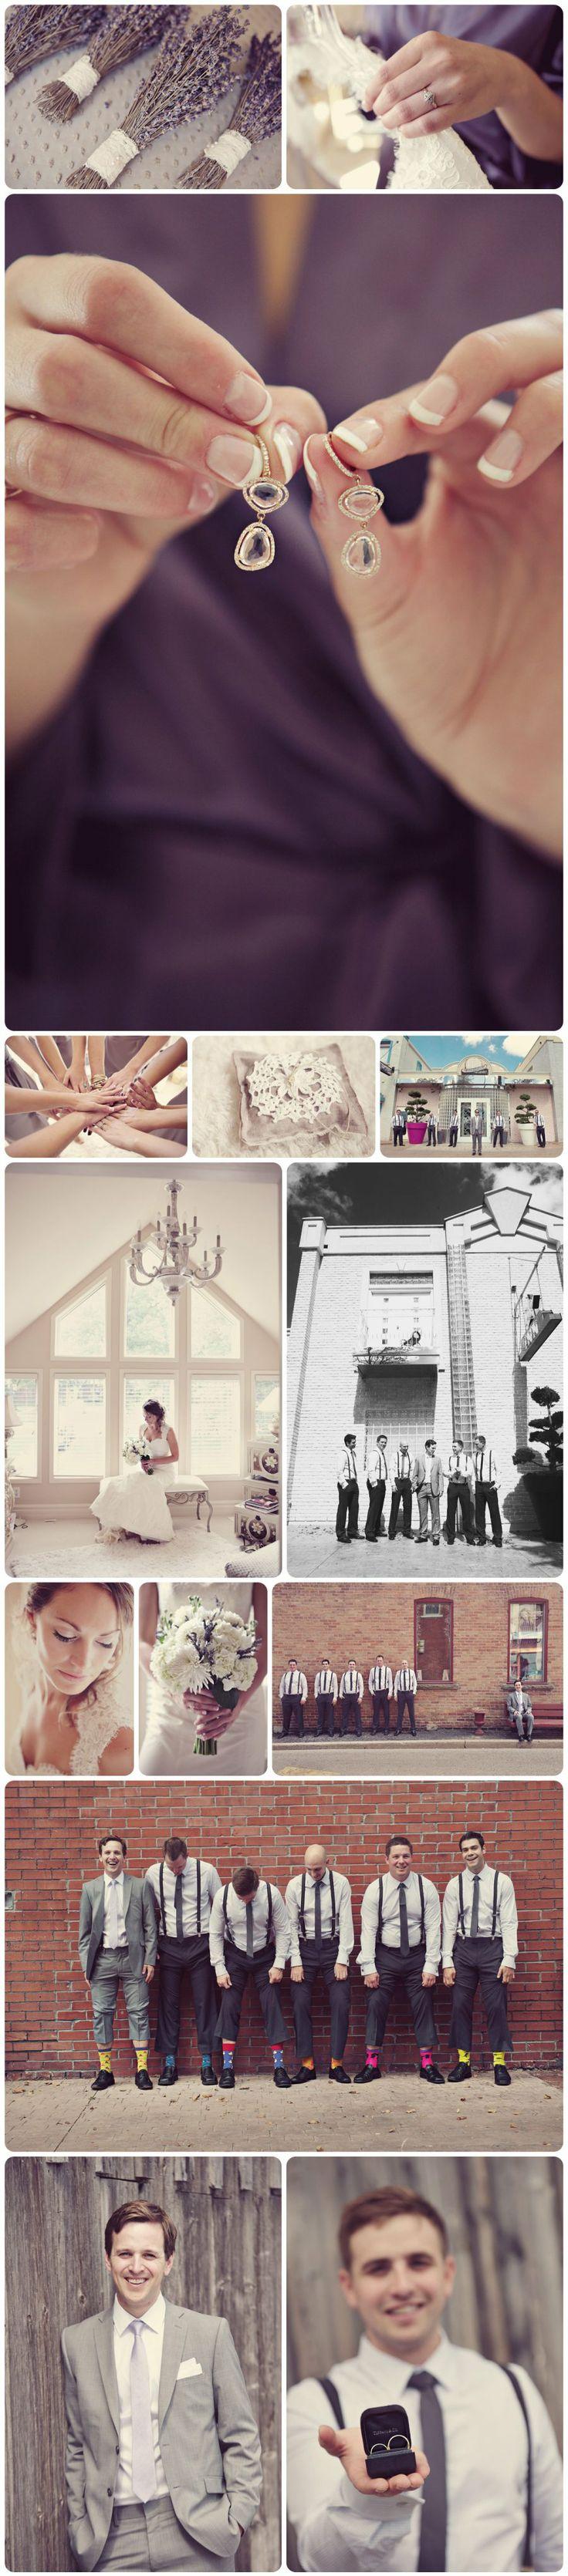 Chatham Ontario Wedding Venue-The Retro Suites Hotel